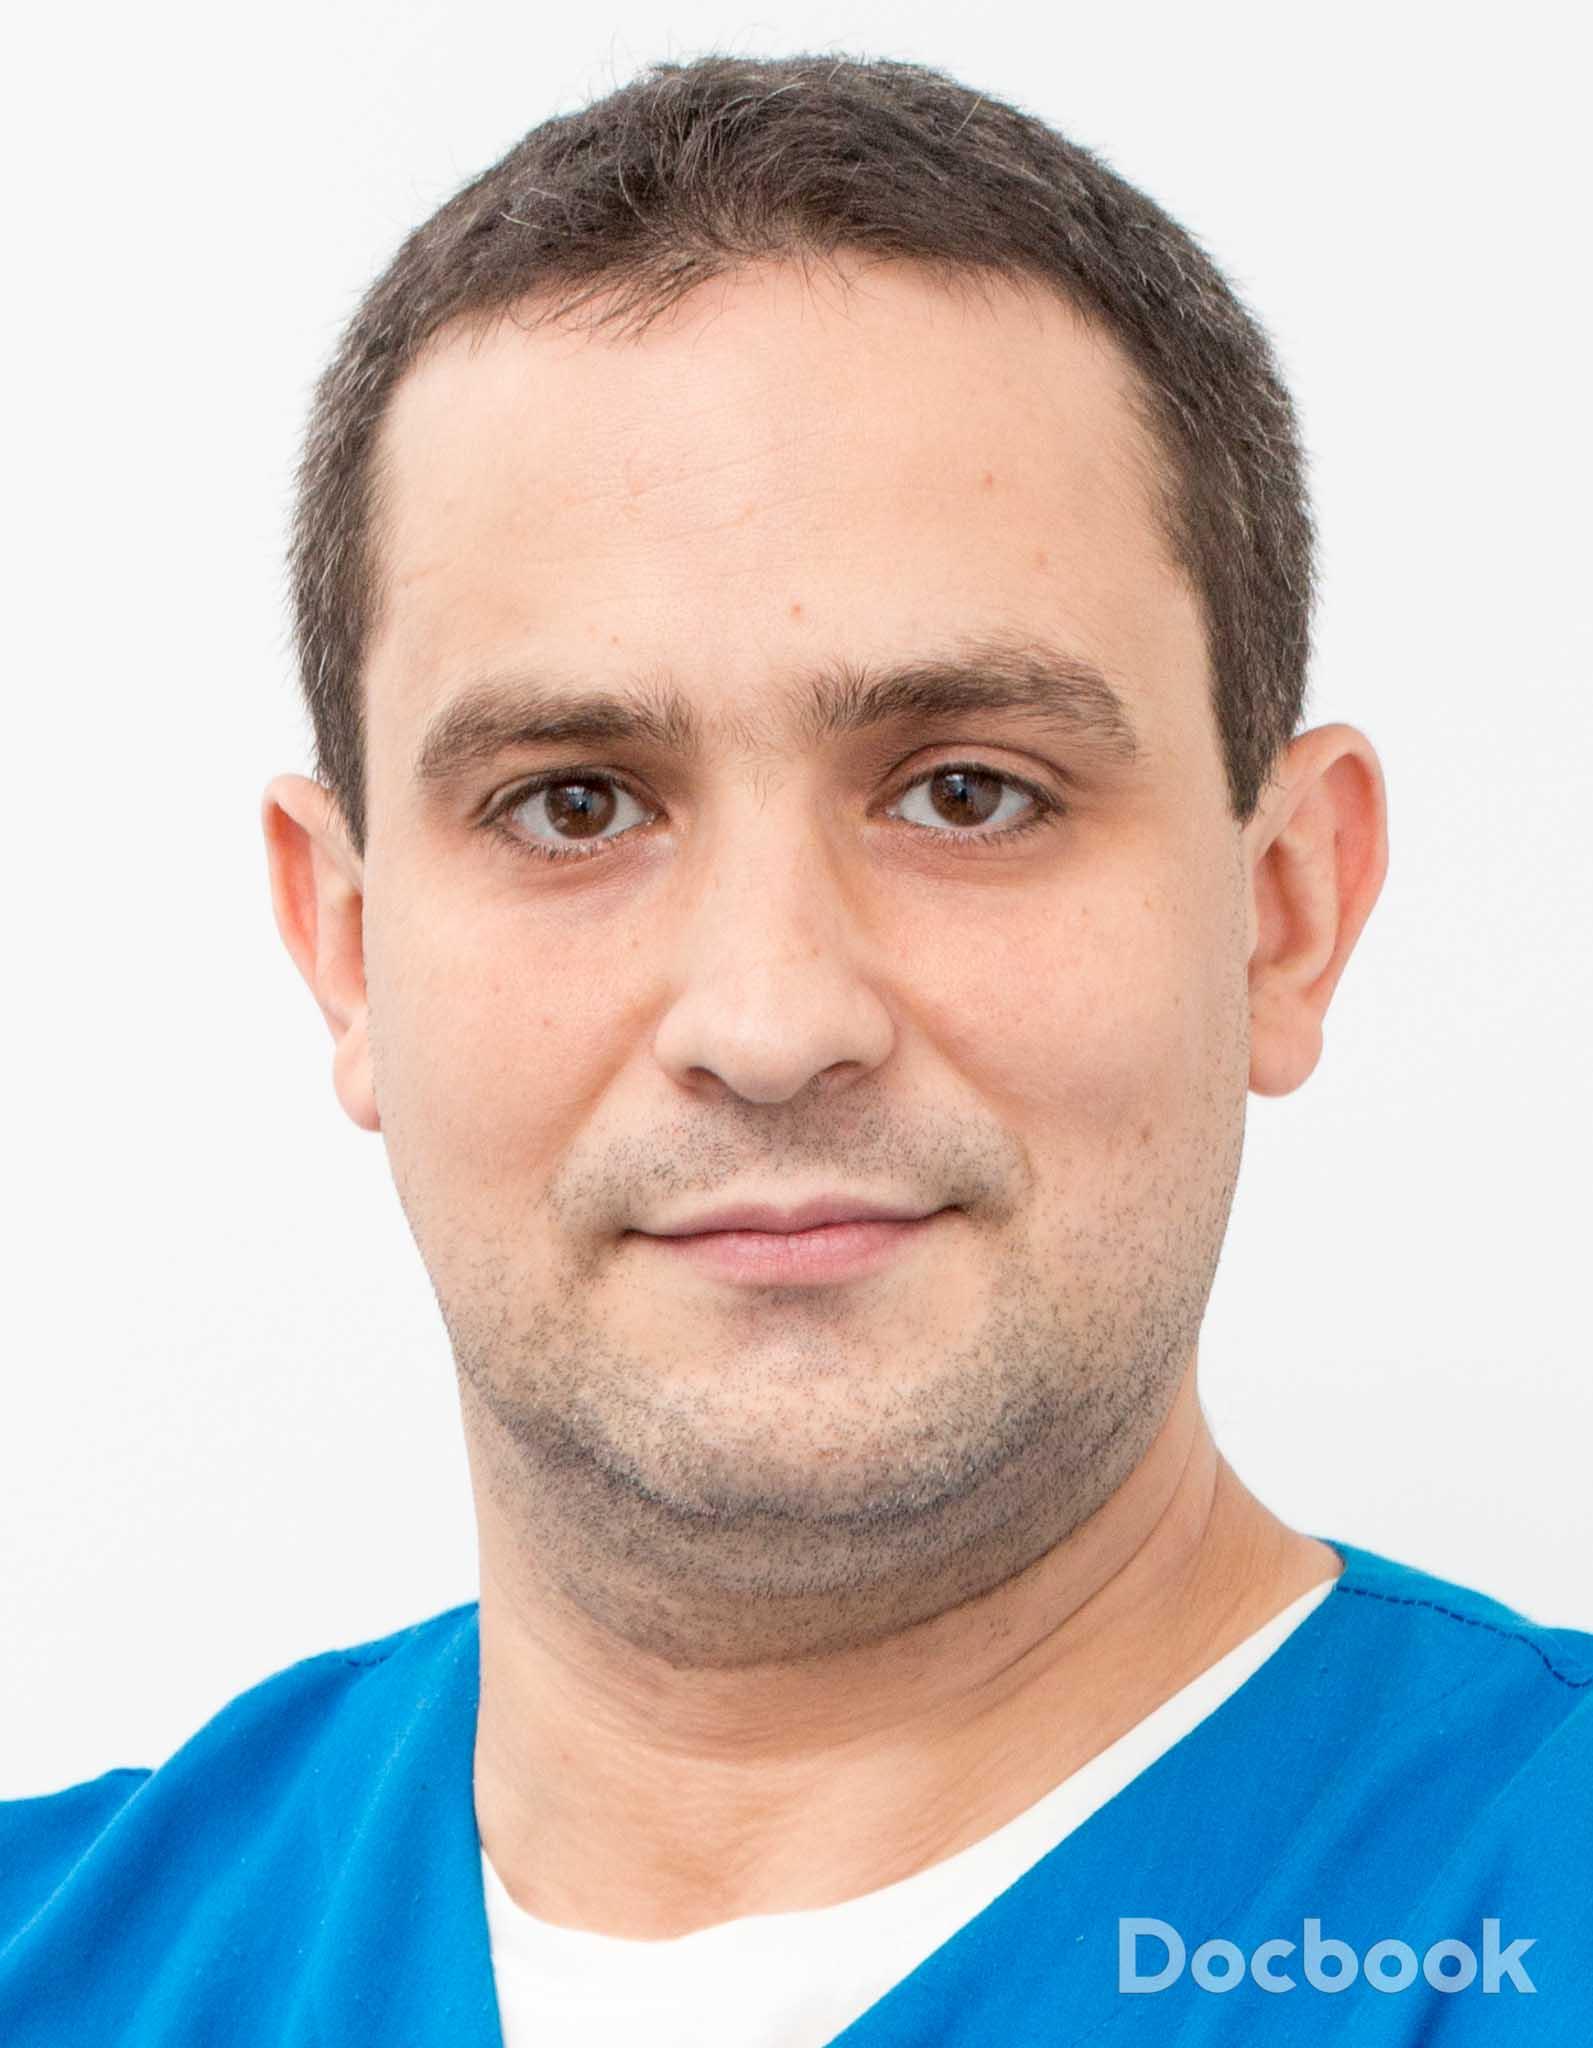 Dr. Catalin-Andrei Tudor